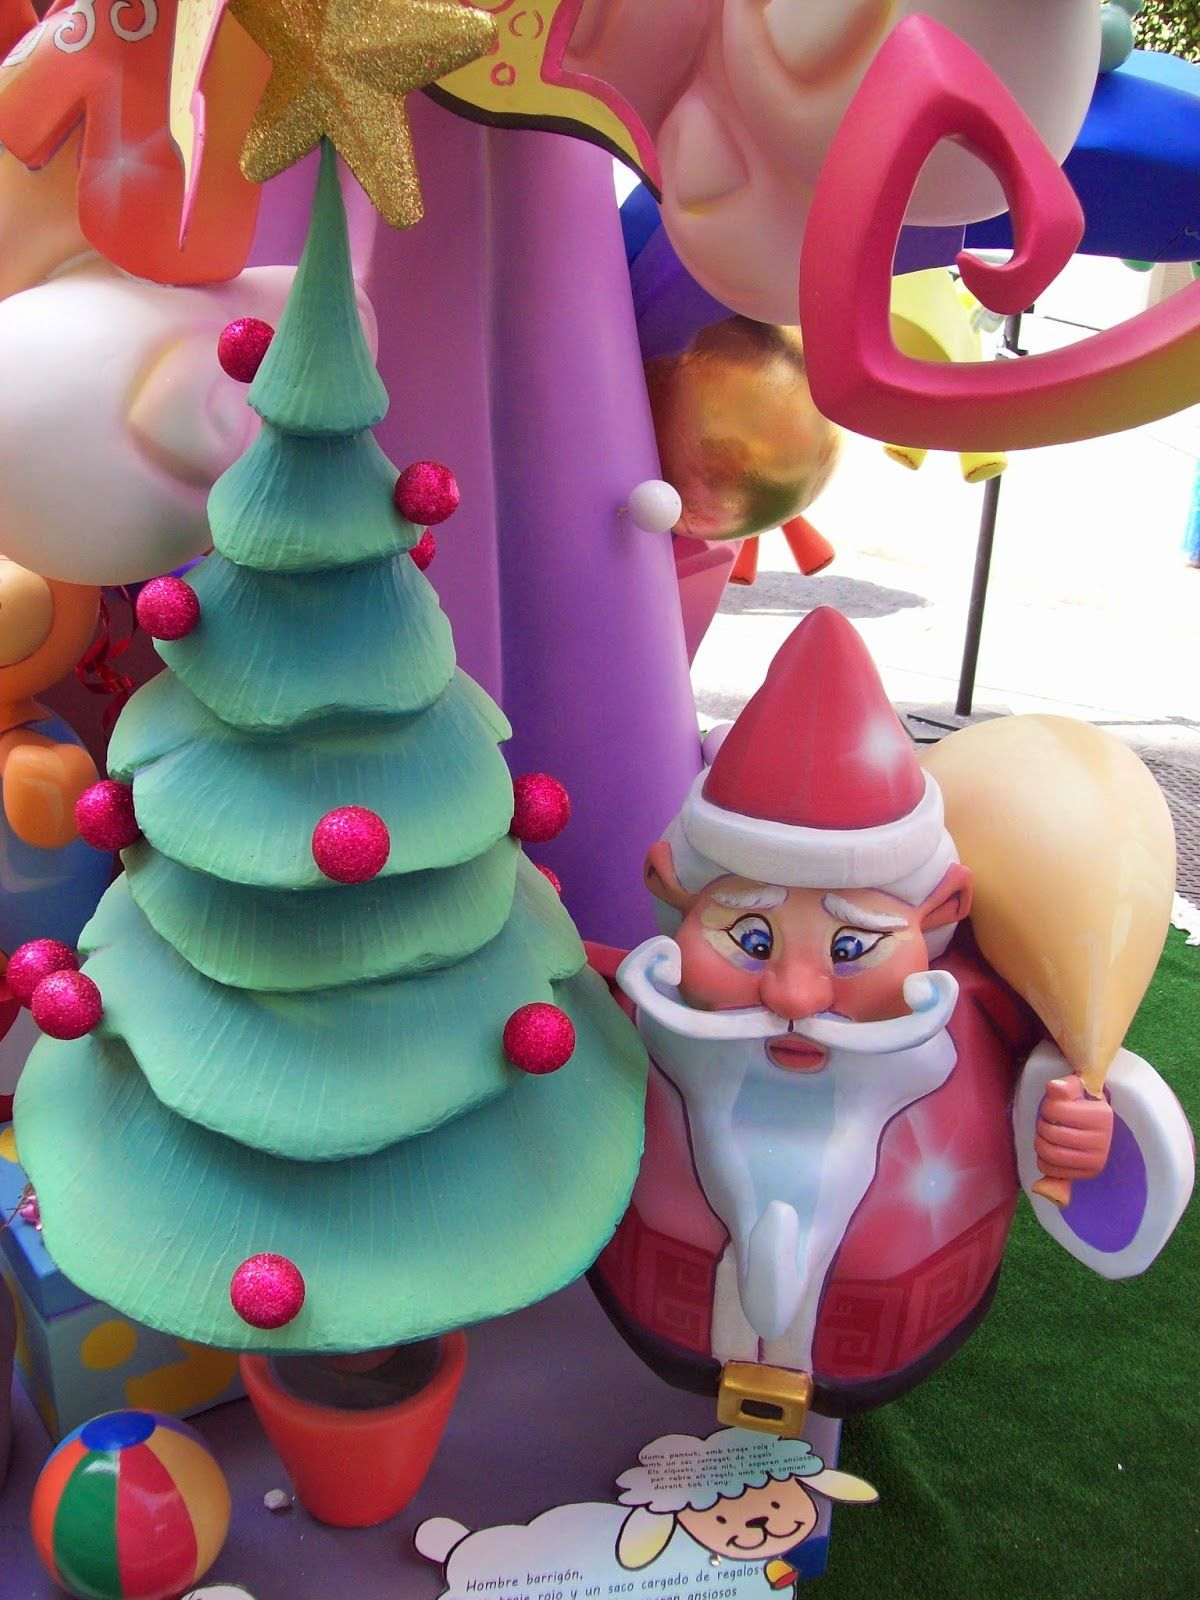 POP ART, KITSCH & CURIOSITIES: So, this is Christmas